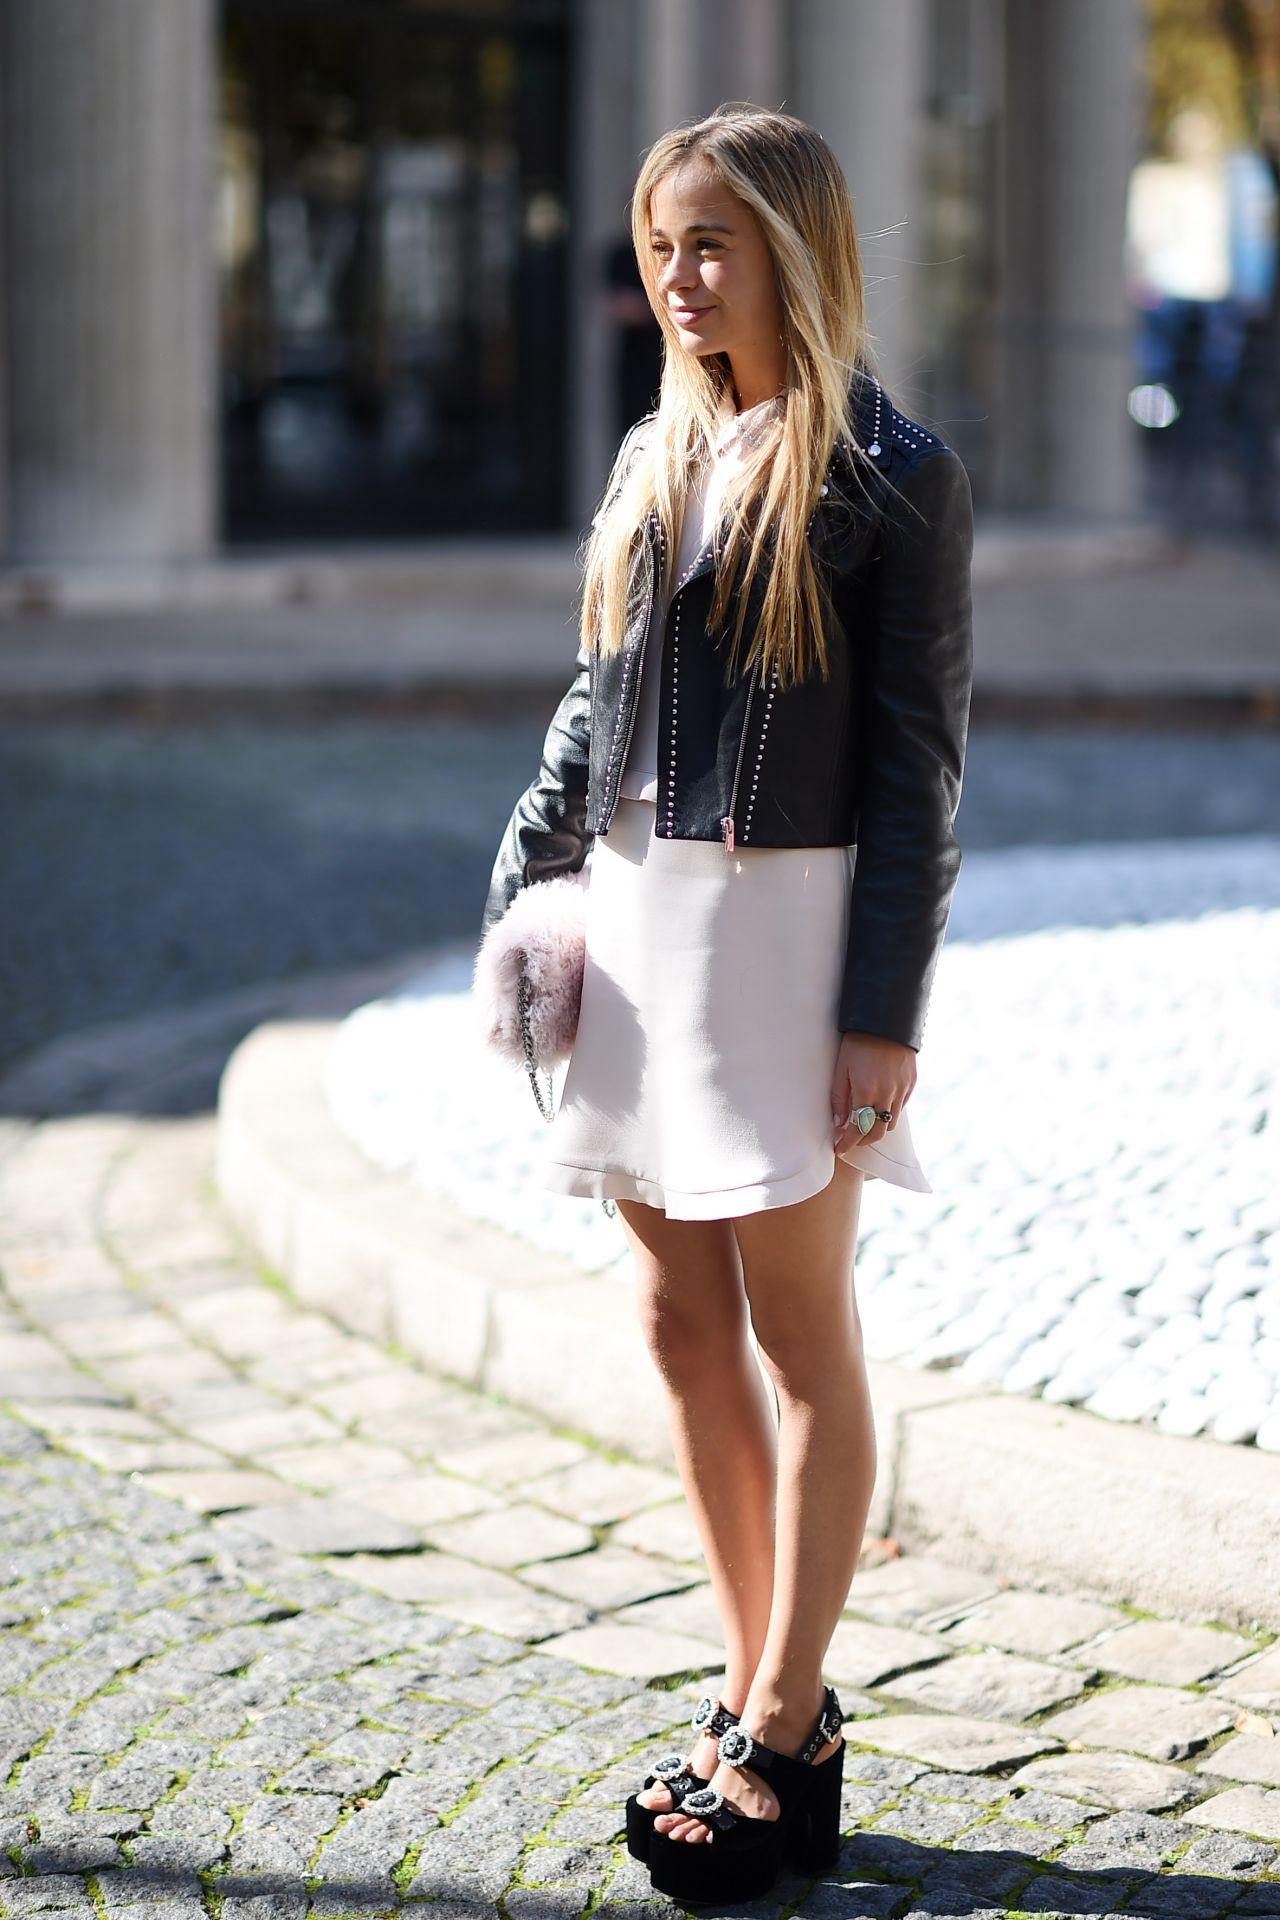 Amelia Windsor Ndash Miu Fashion Show In Paris 10 03 2017